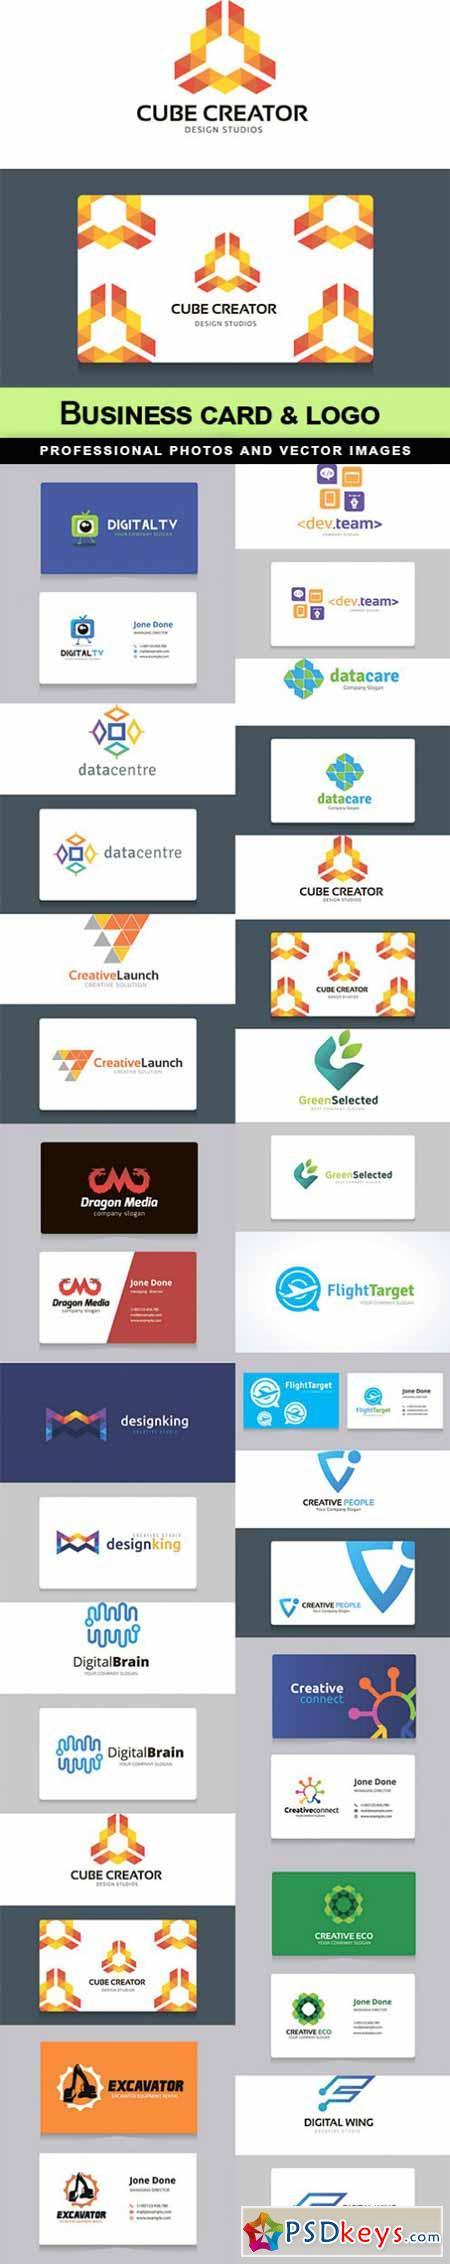 Business card & logo - 17 EPS